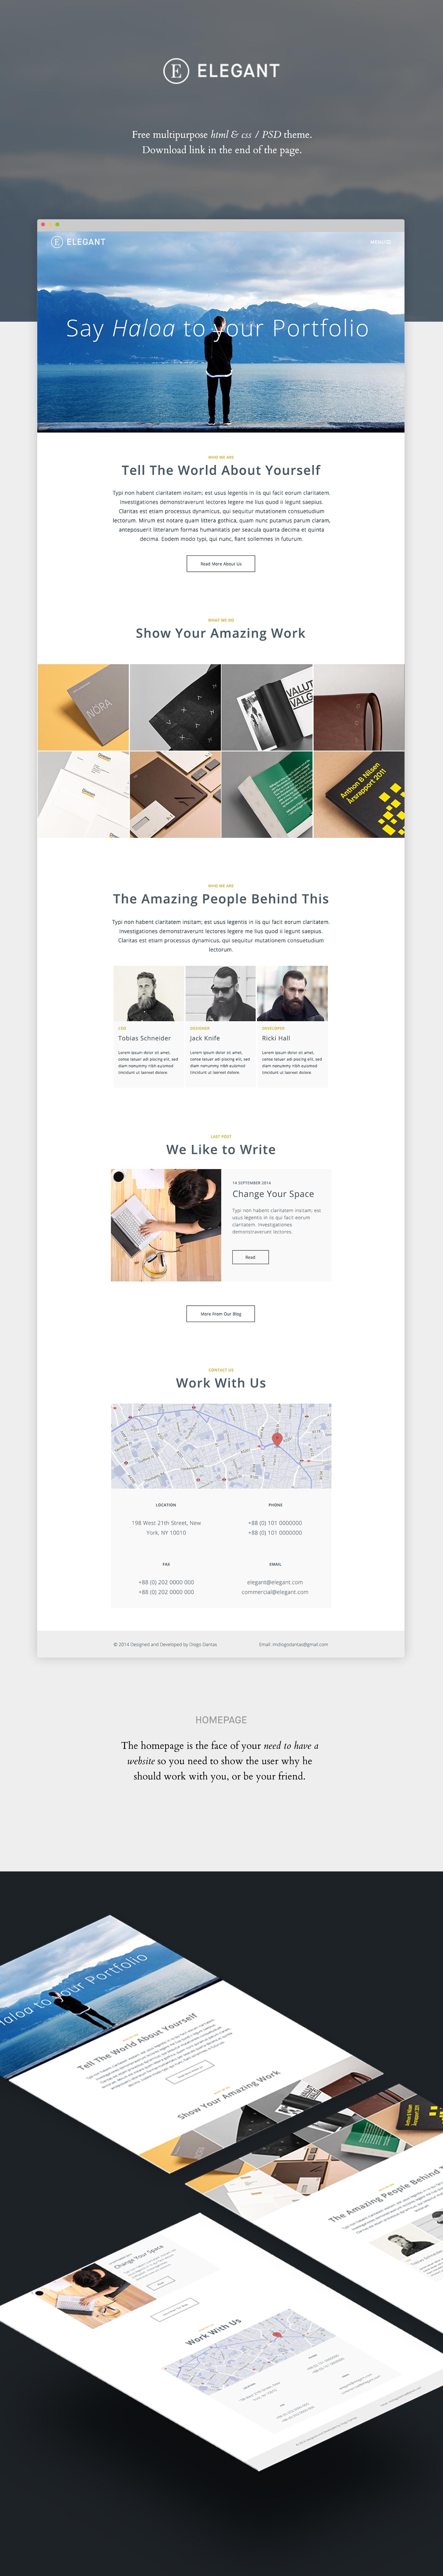 behance presentation template psd brettfranklin co